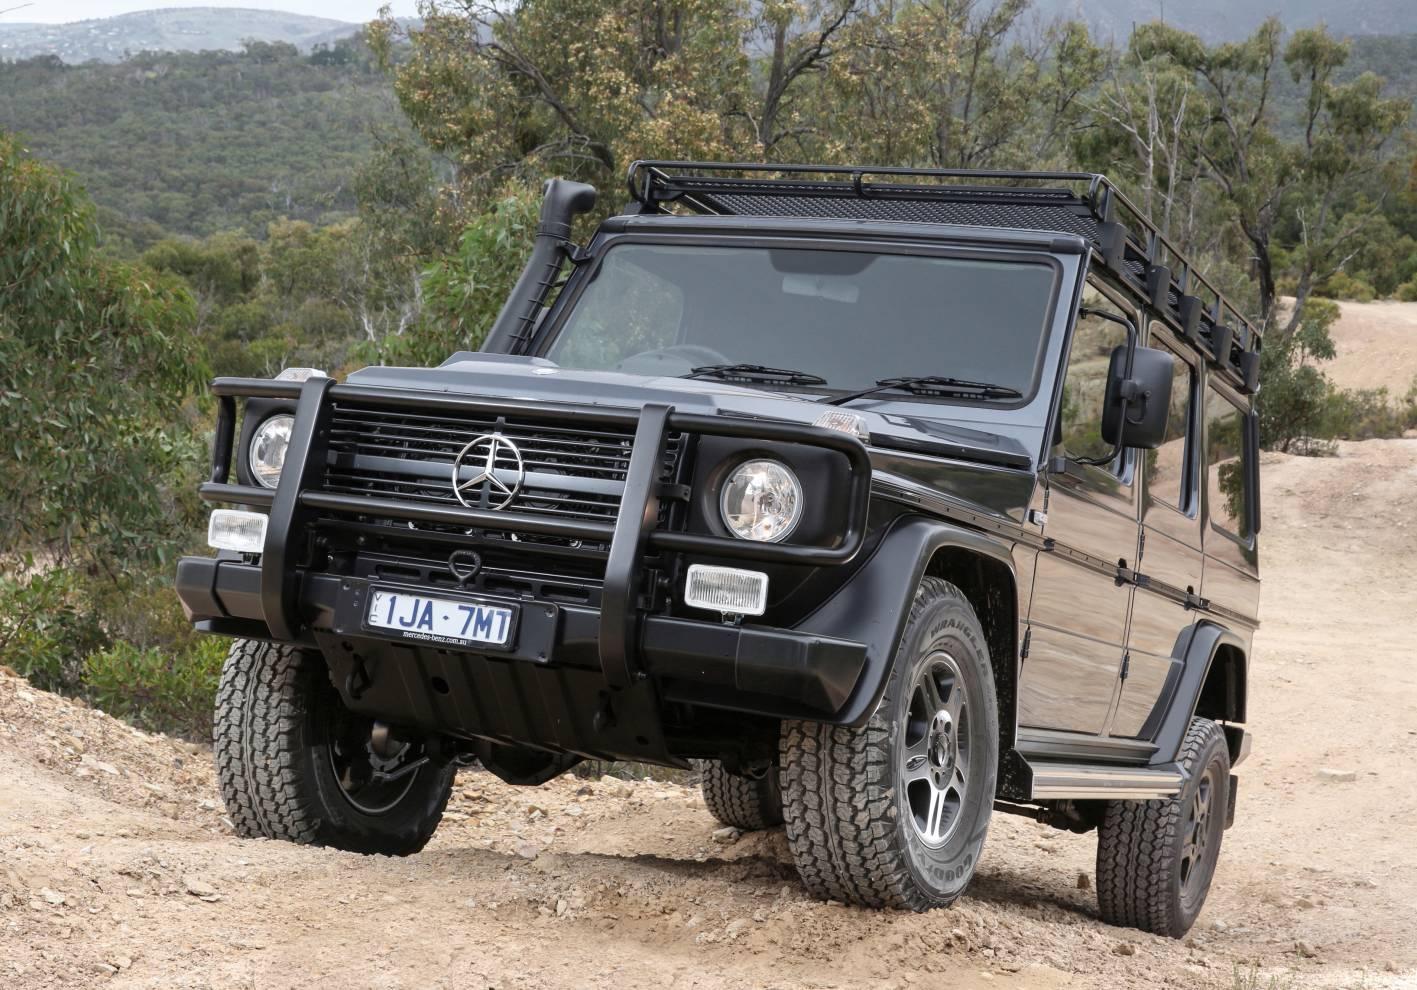 Mercedes Benz G 300 Cdi Wagon Amp Dual Cab Announced For